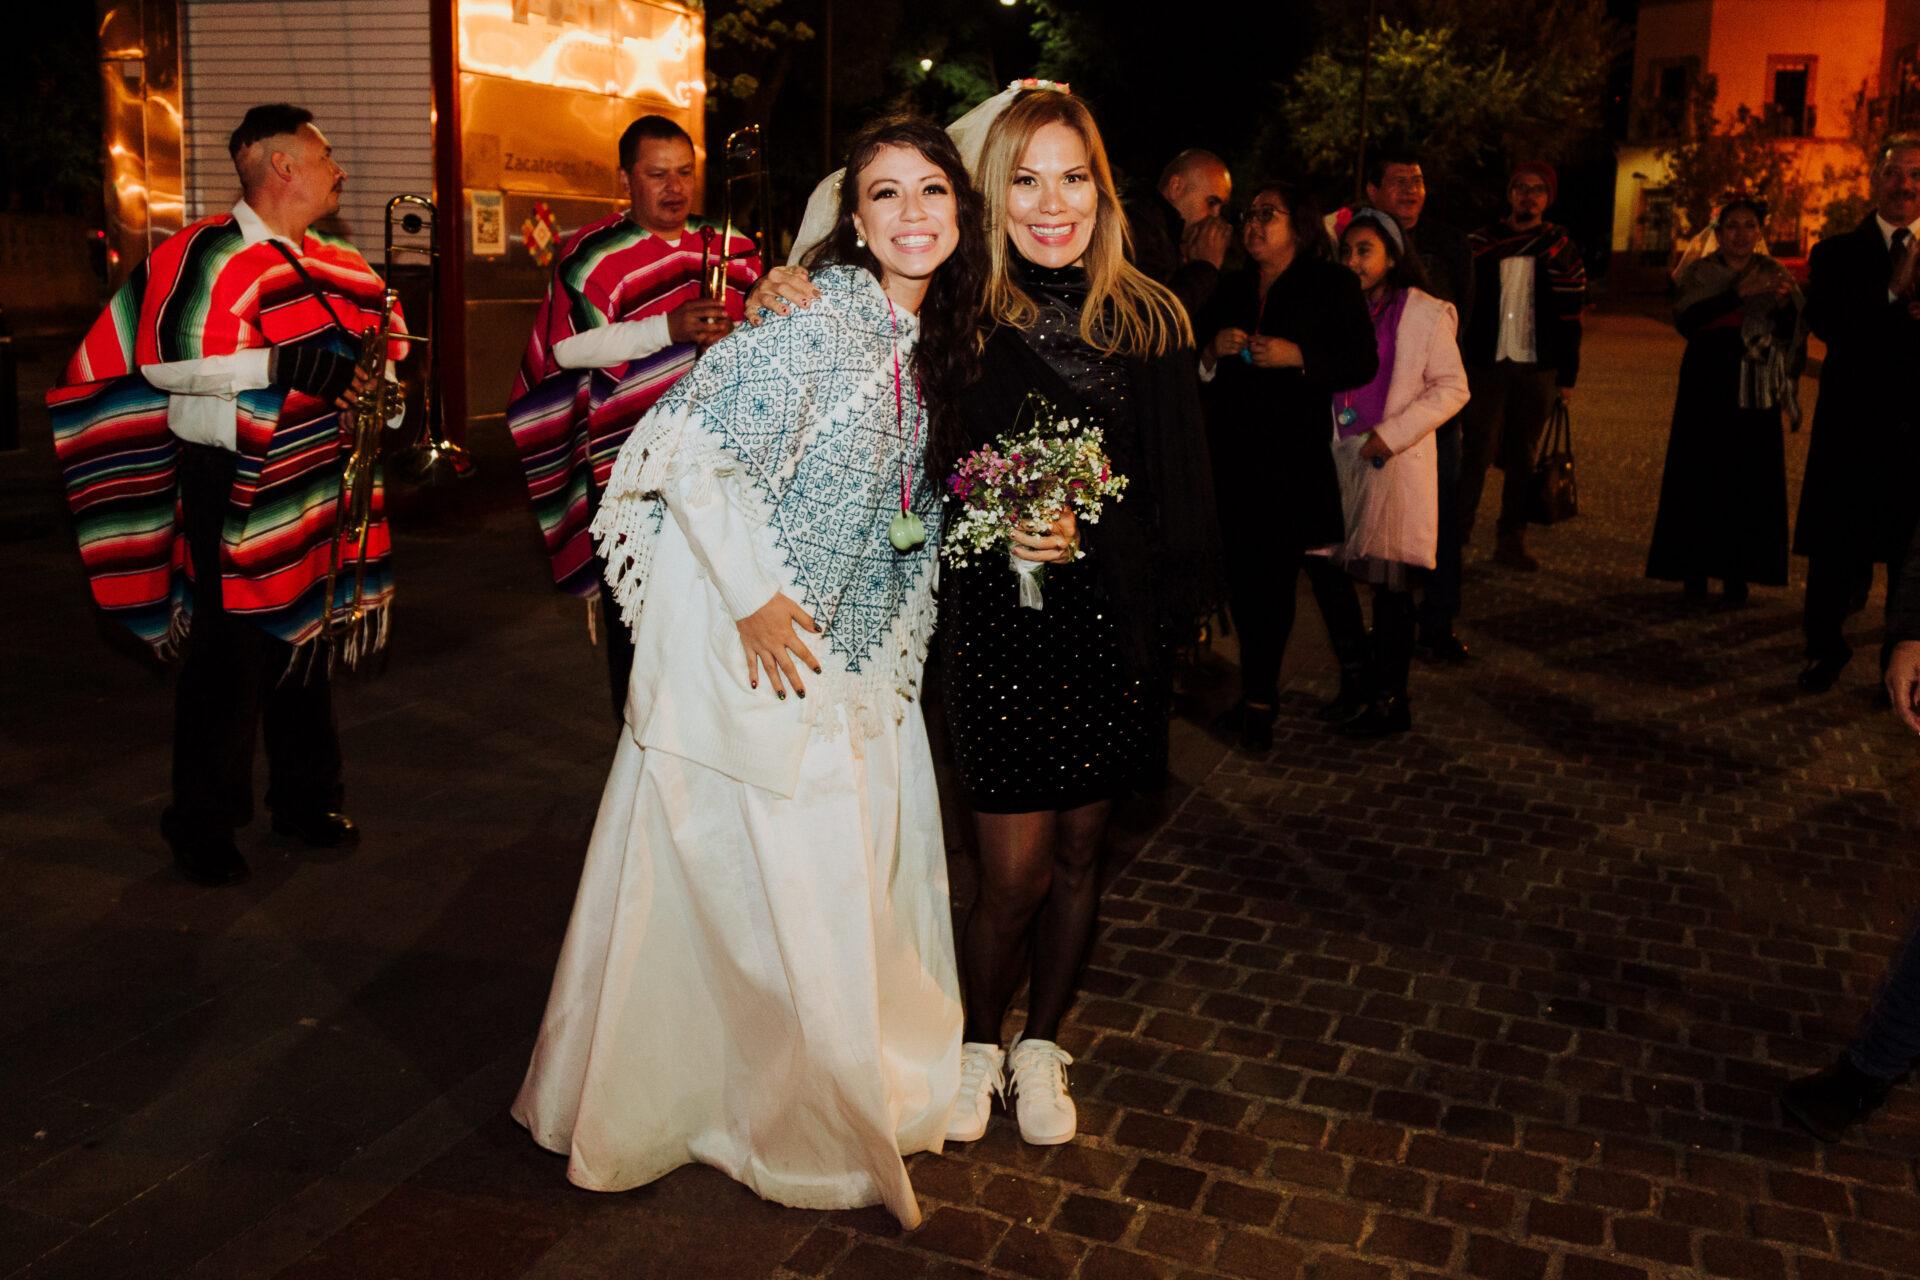 javier_noriega_fotografo_bodas_la_mina_club_zacatecas_wedding_photographer41